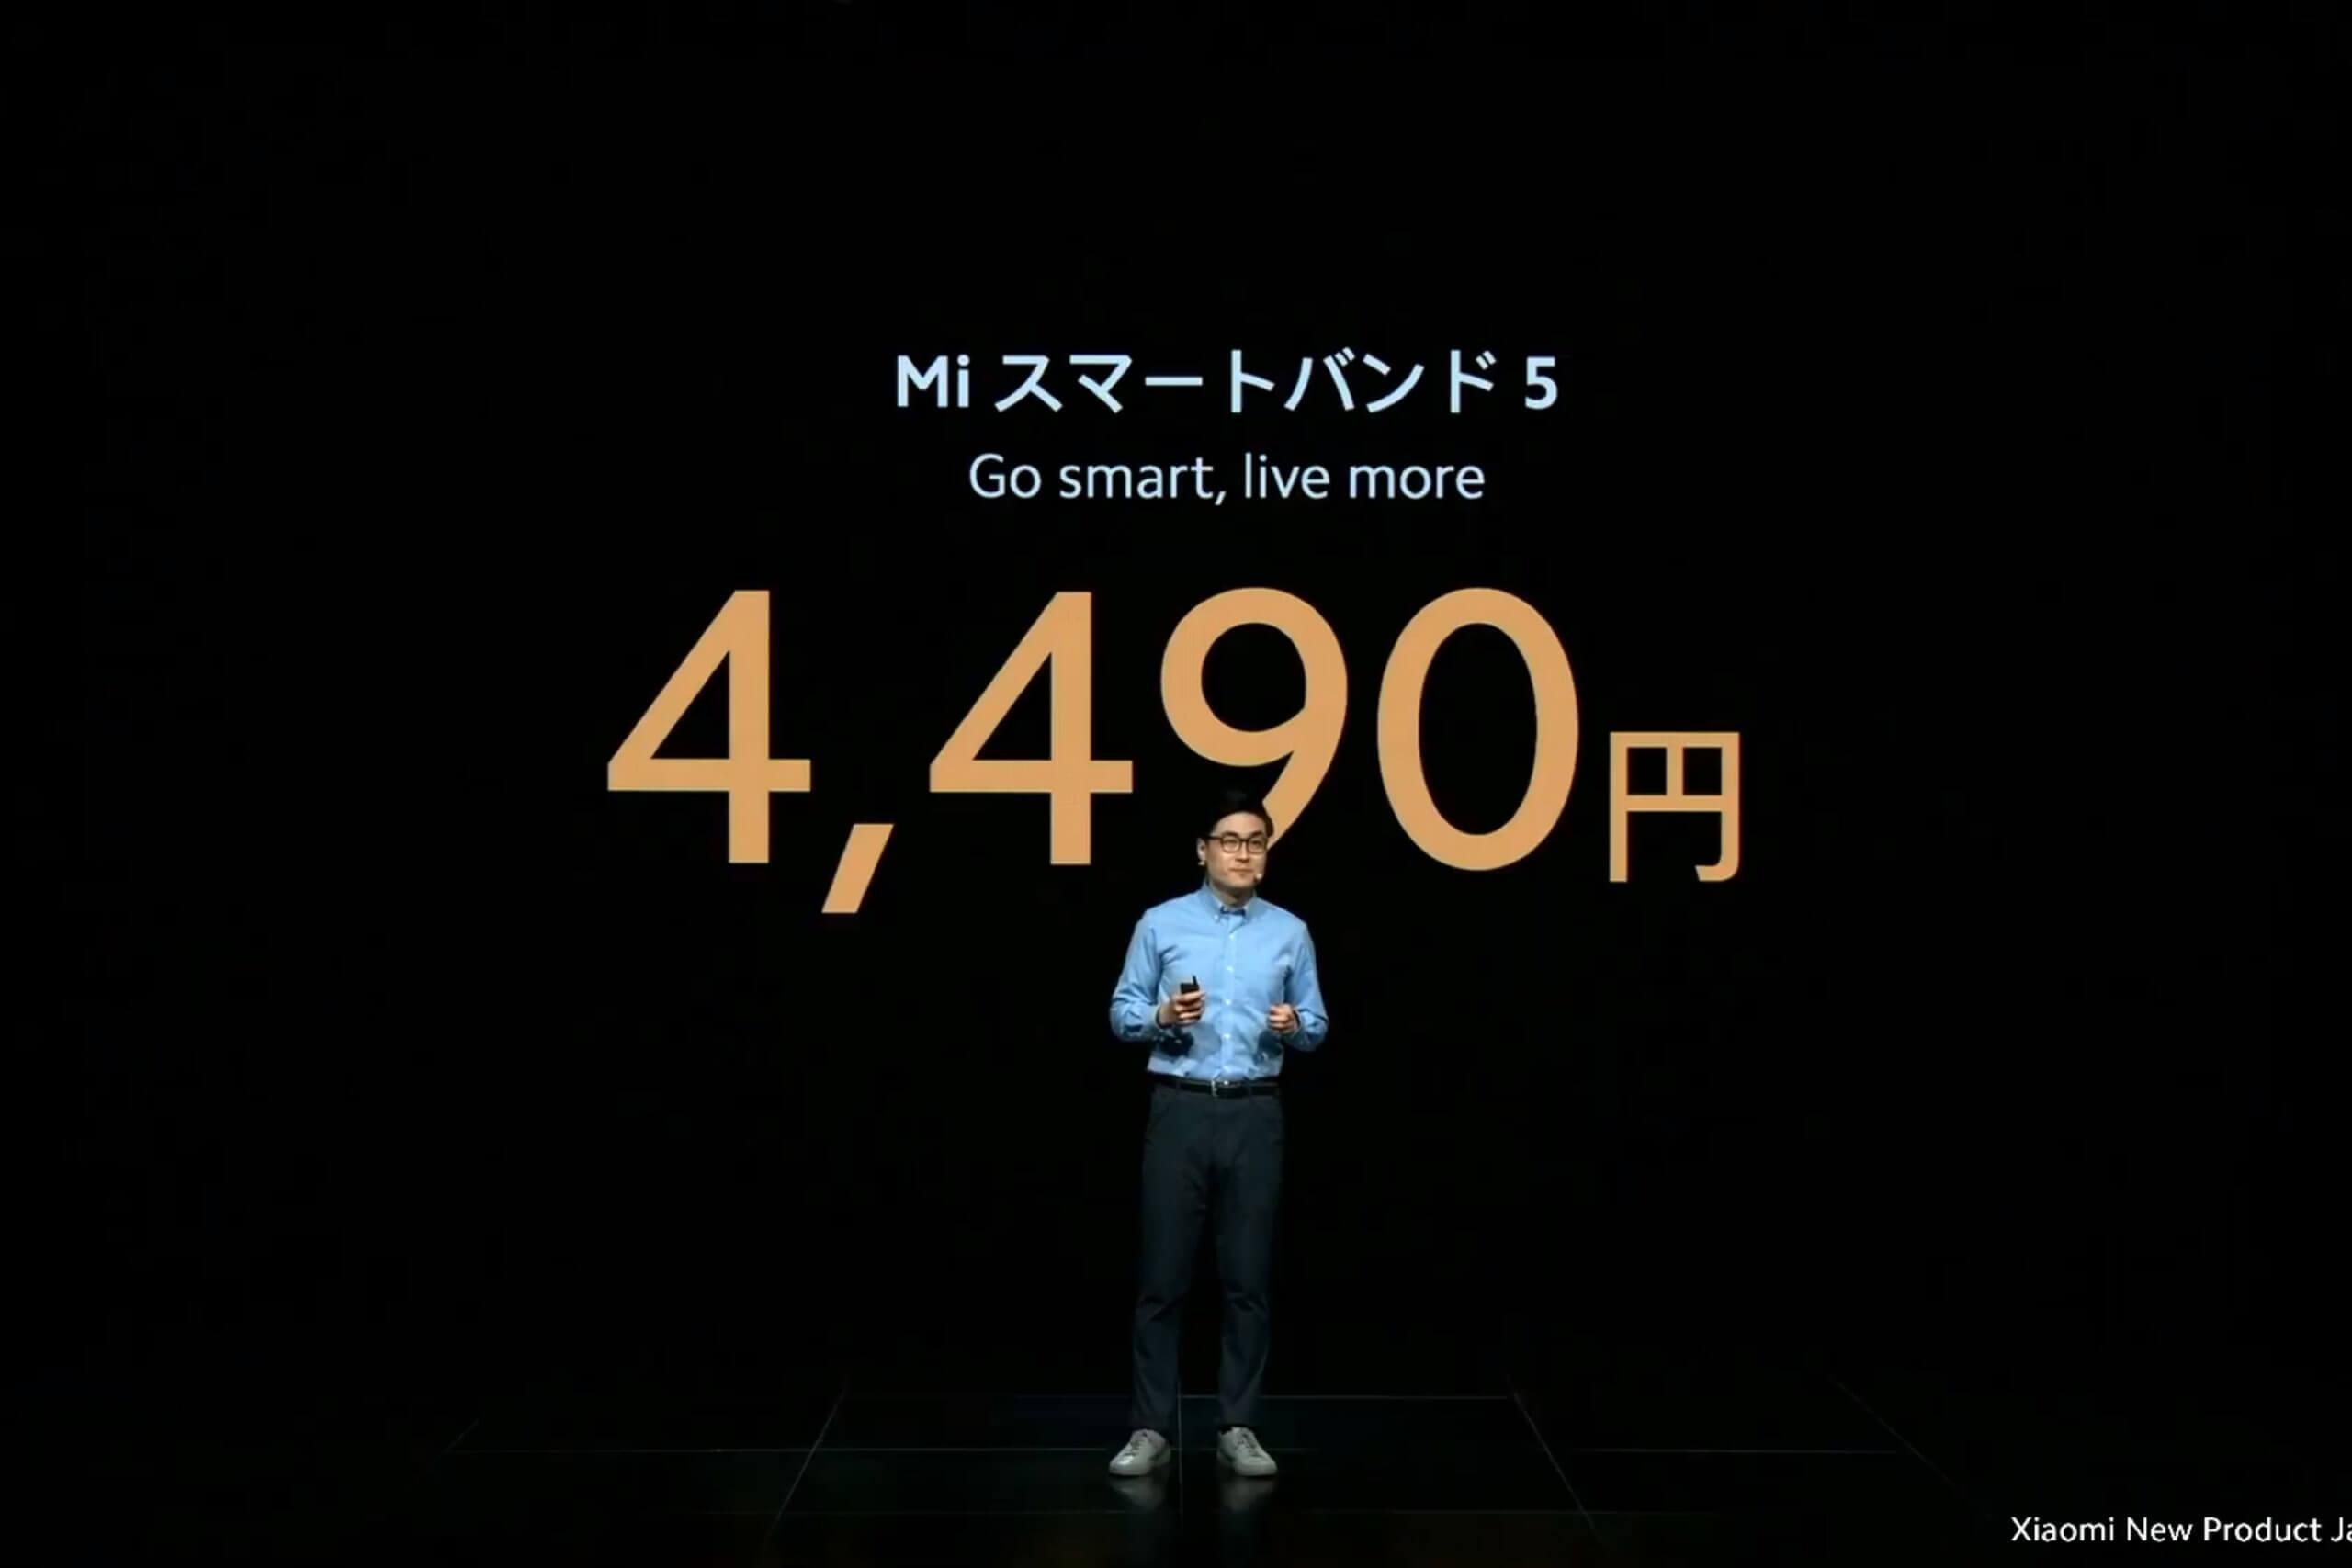 Miスマートバンド5日本語版価格は4,490円(税込み)